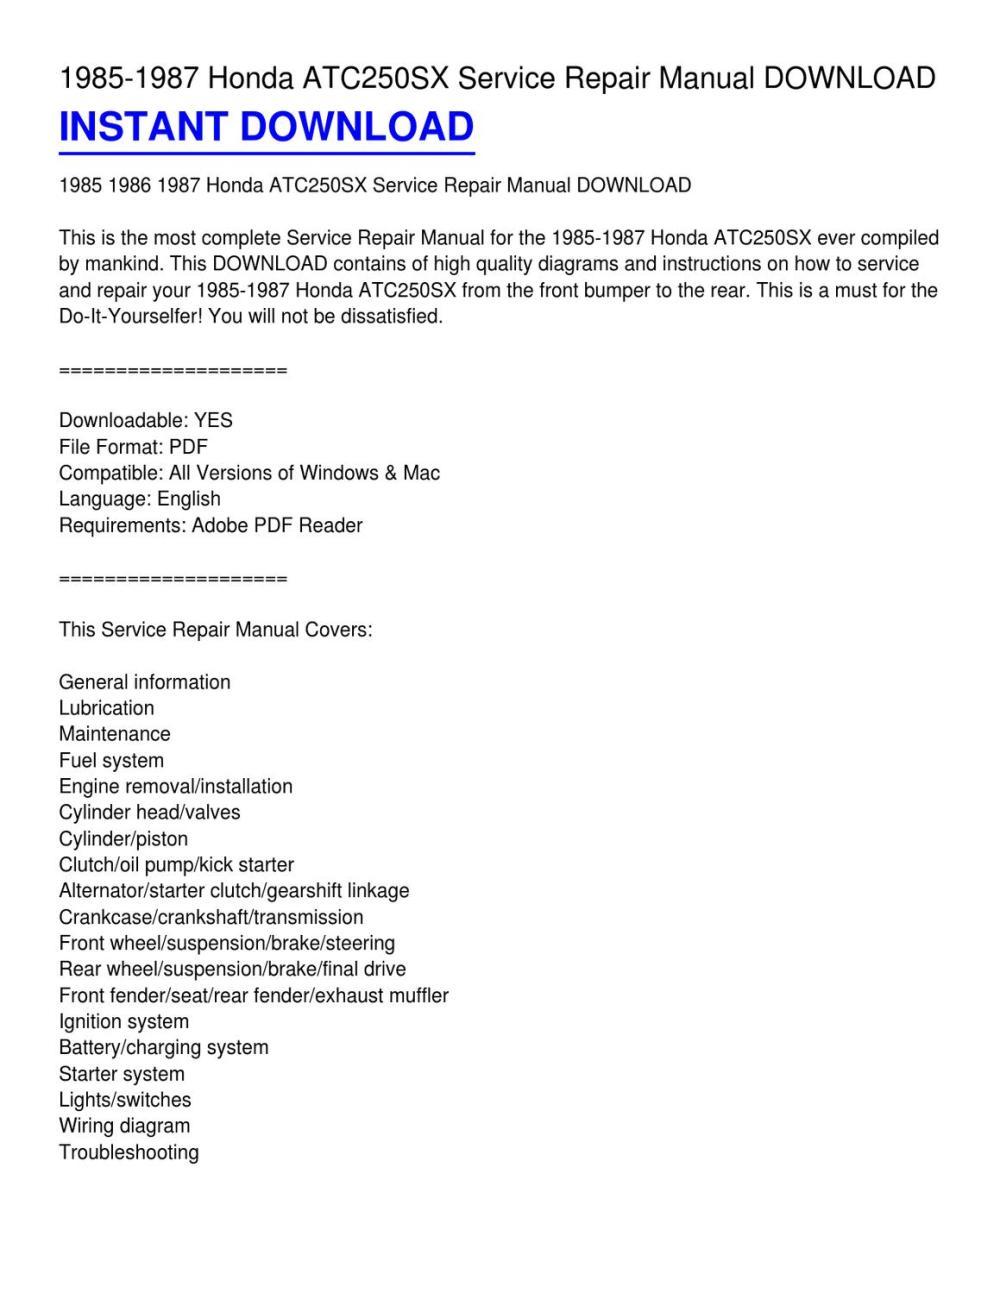 medium resolution of 1985 1987 honda atc250sx service repair manual download by phillip serrano issuu